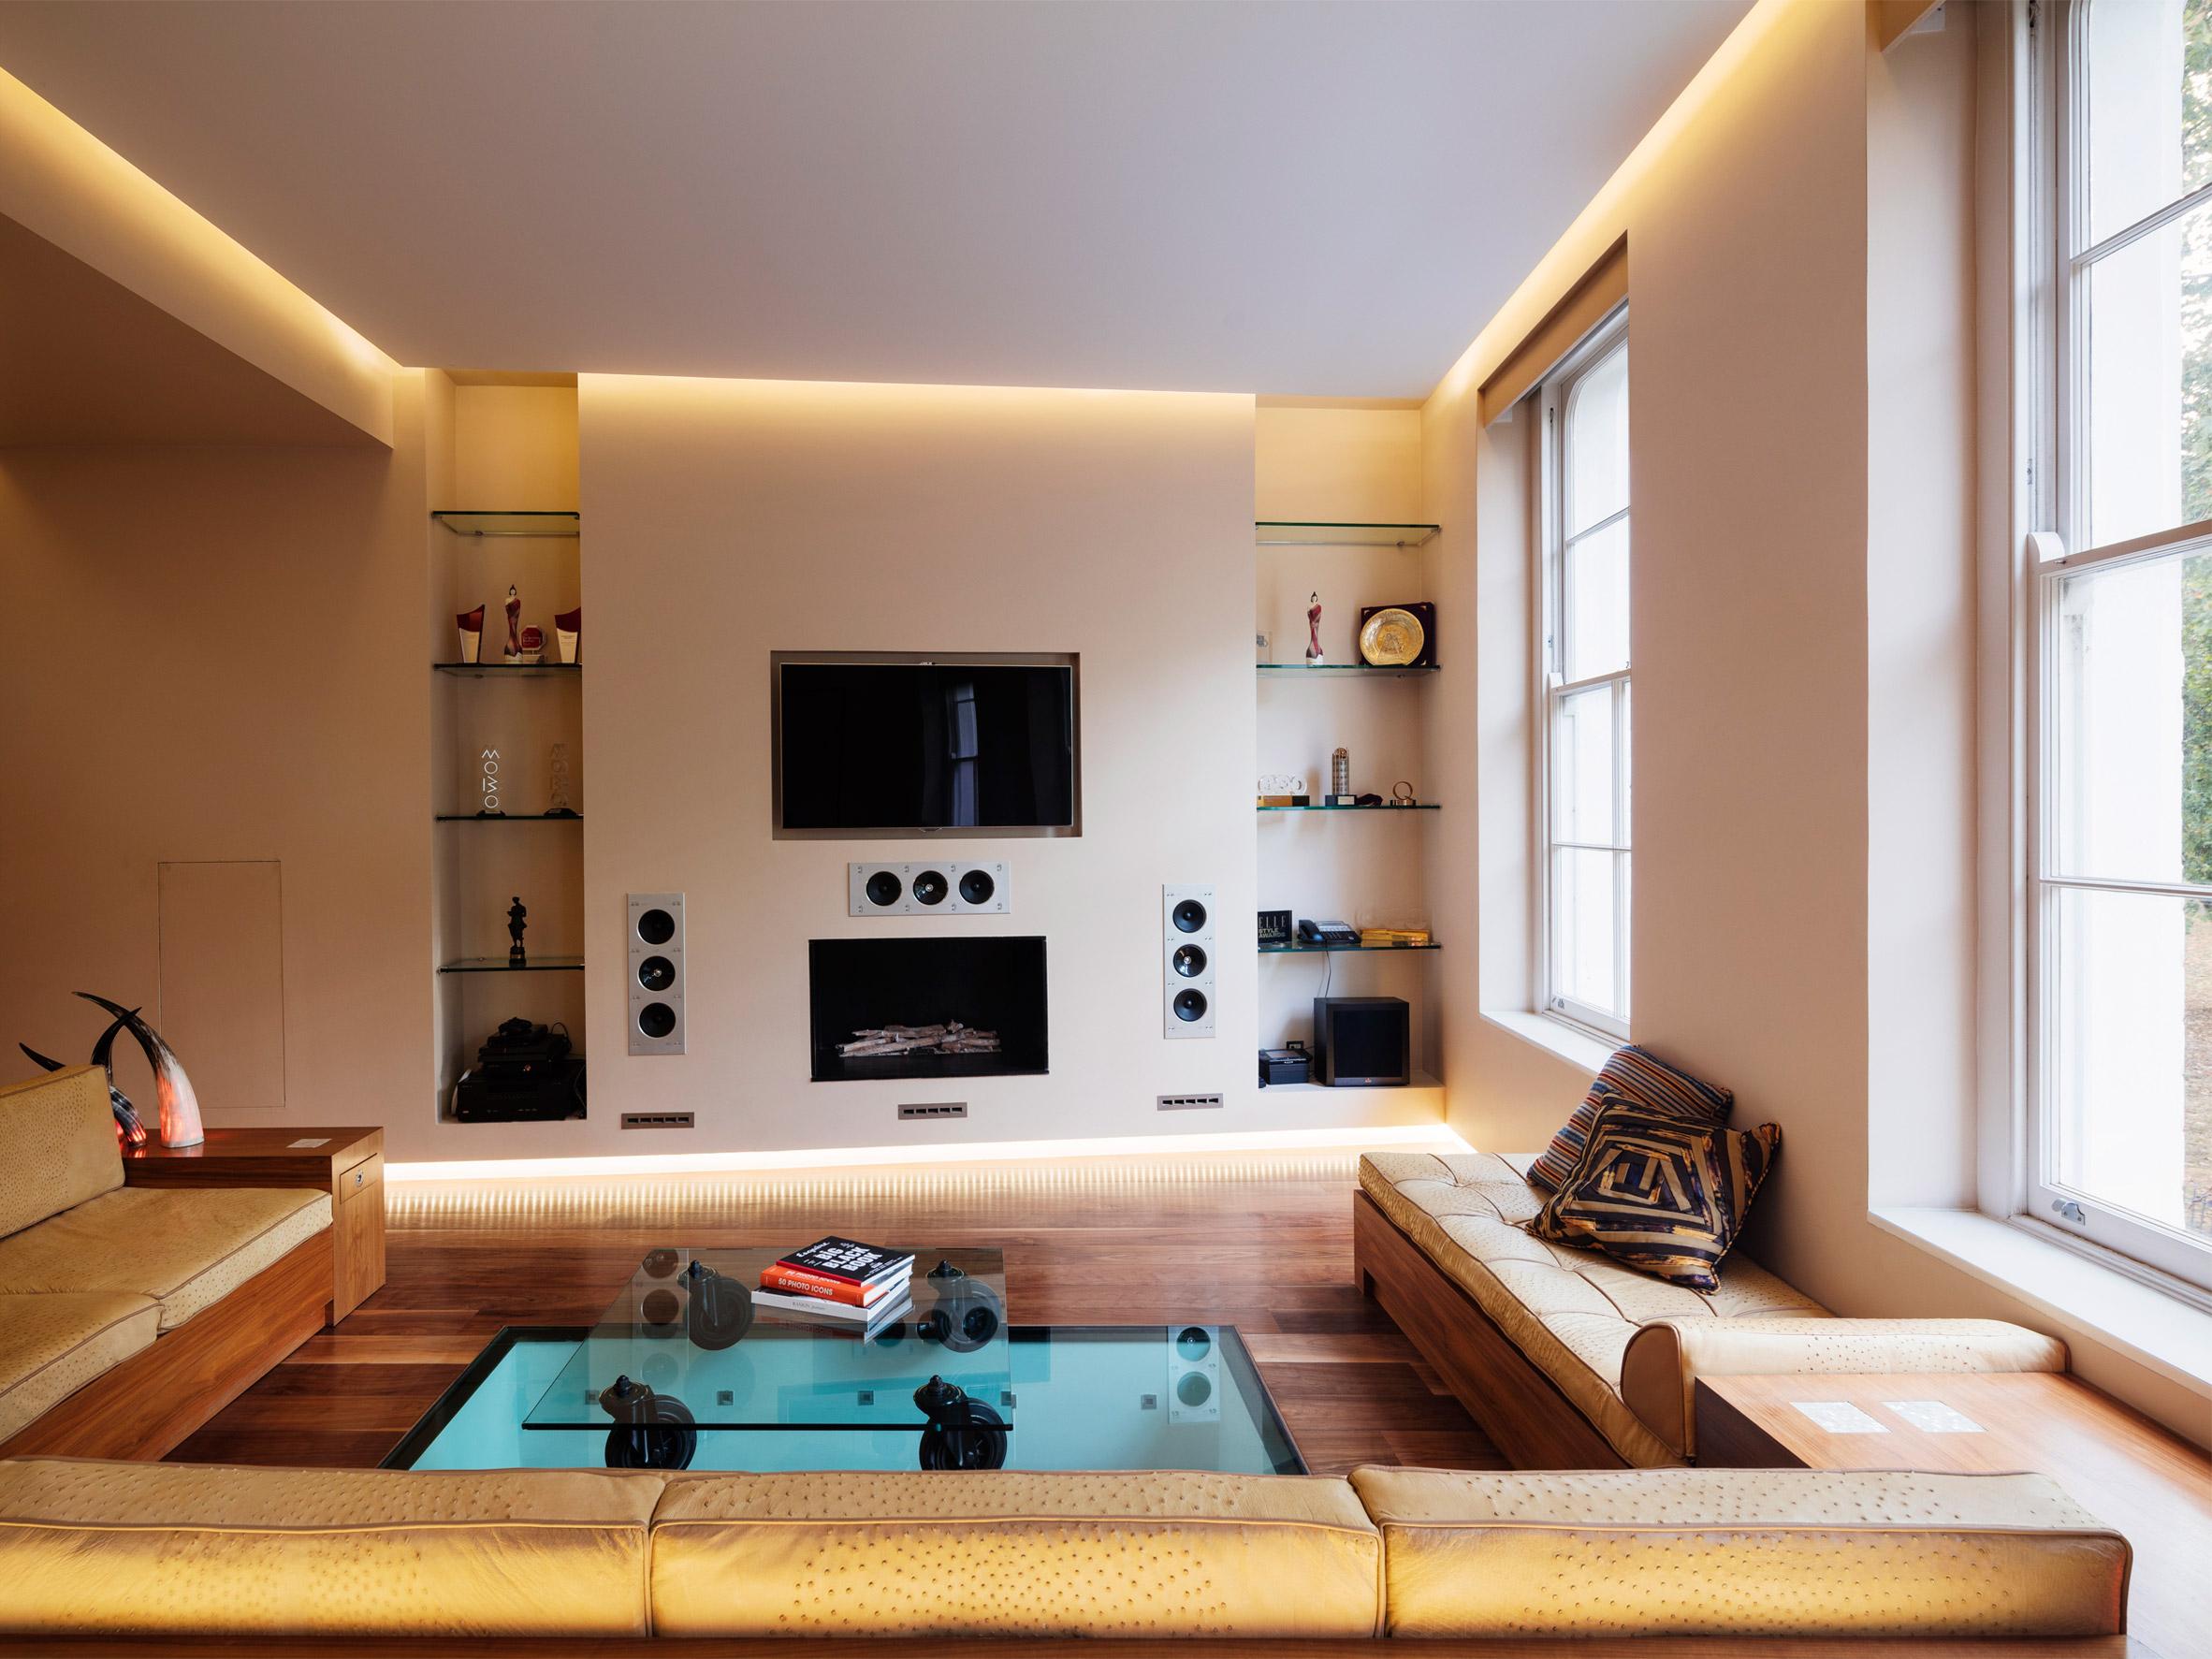 architecture-zebra-interior-design-studia-osnovadesign-osnova-poltava_04